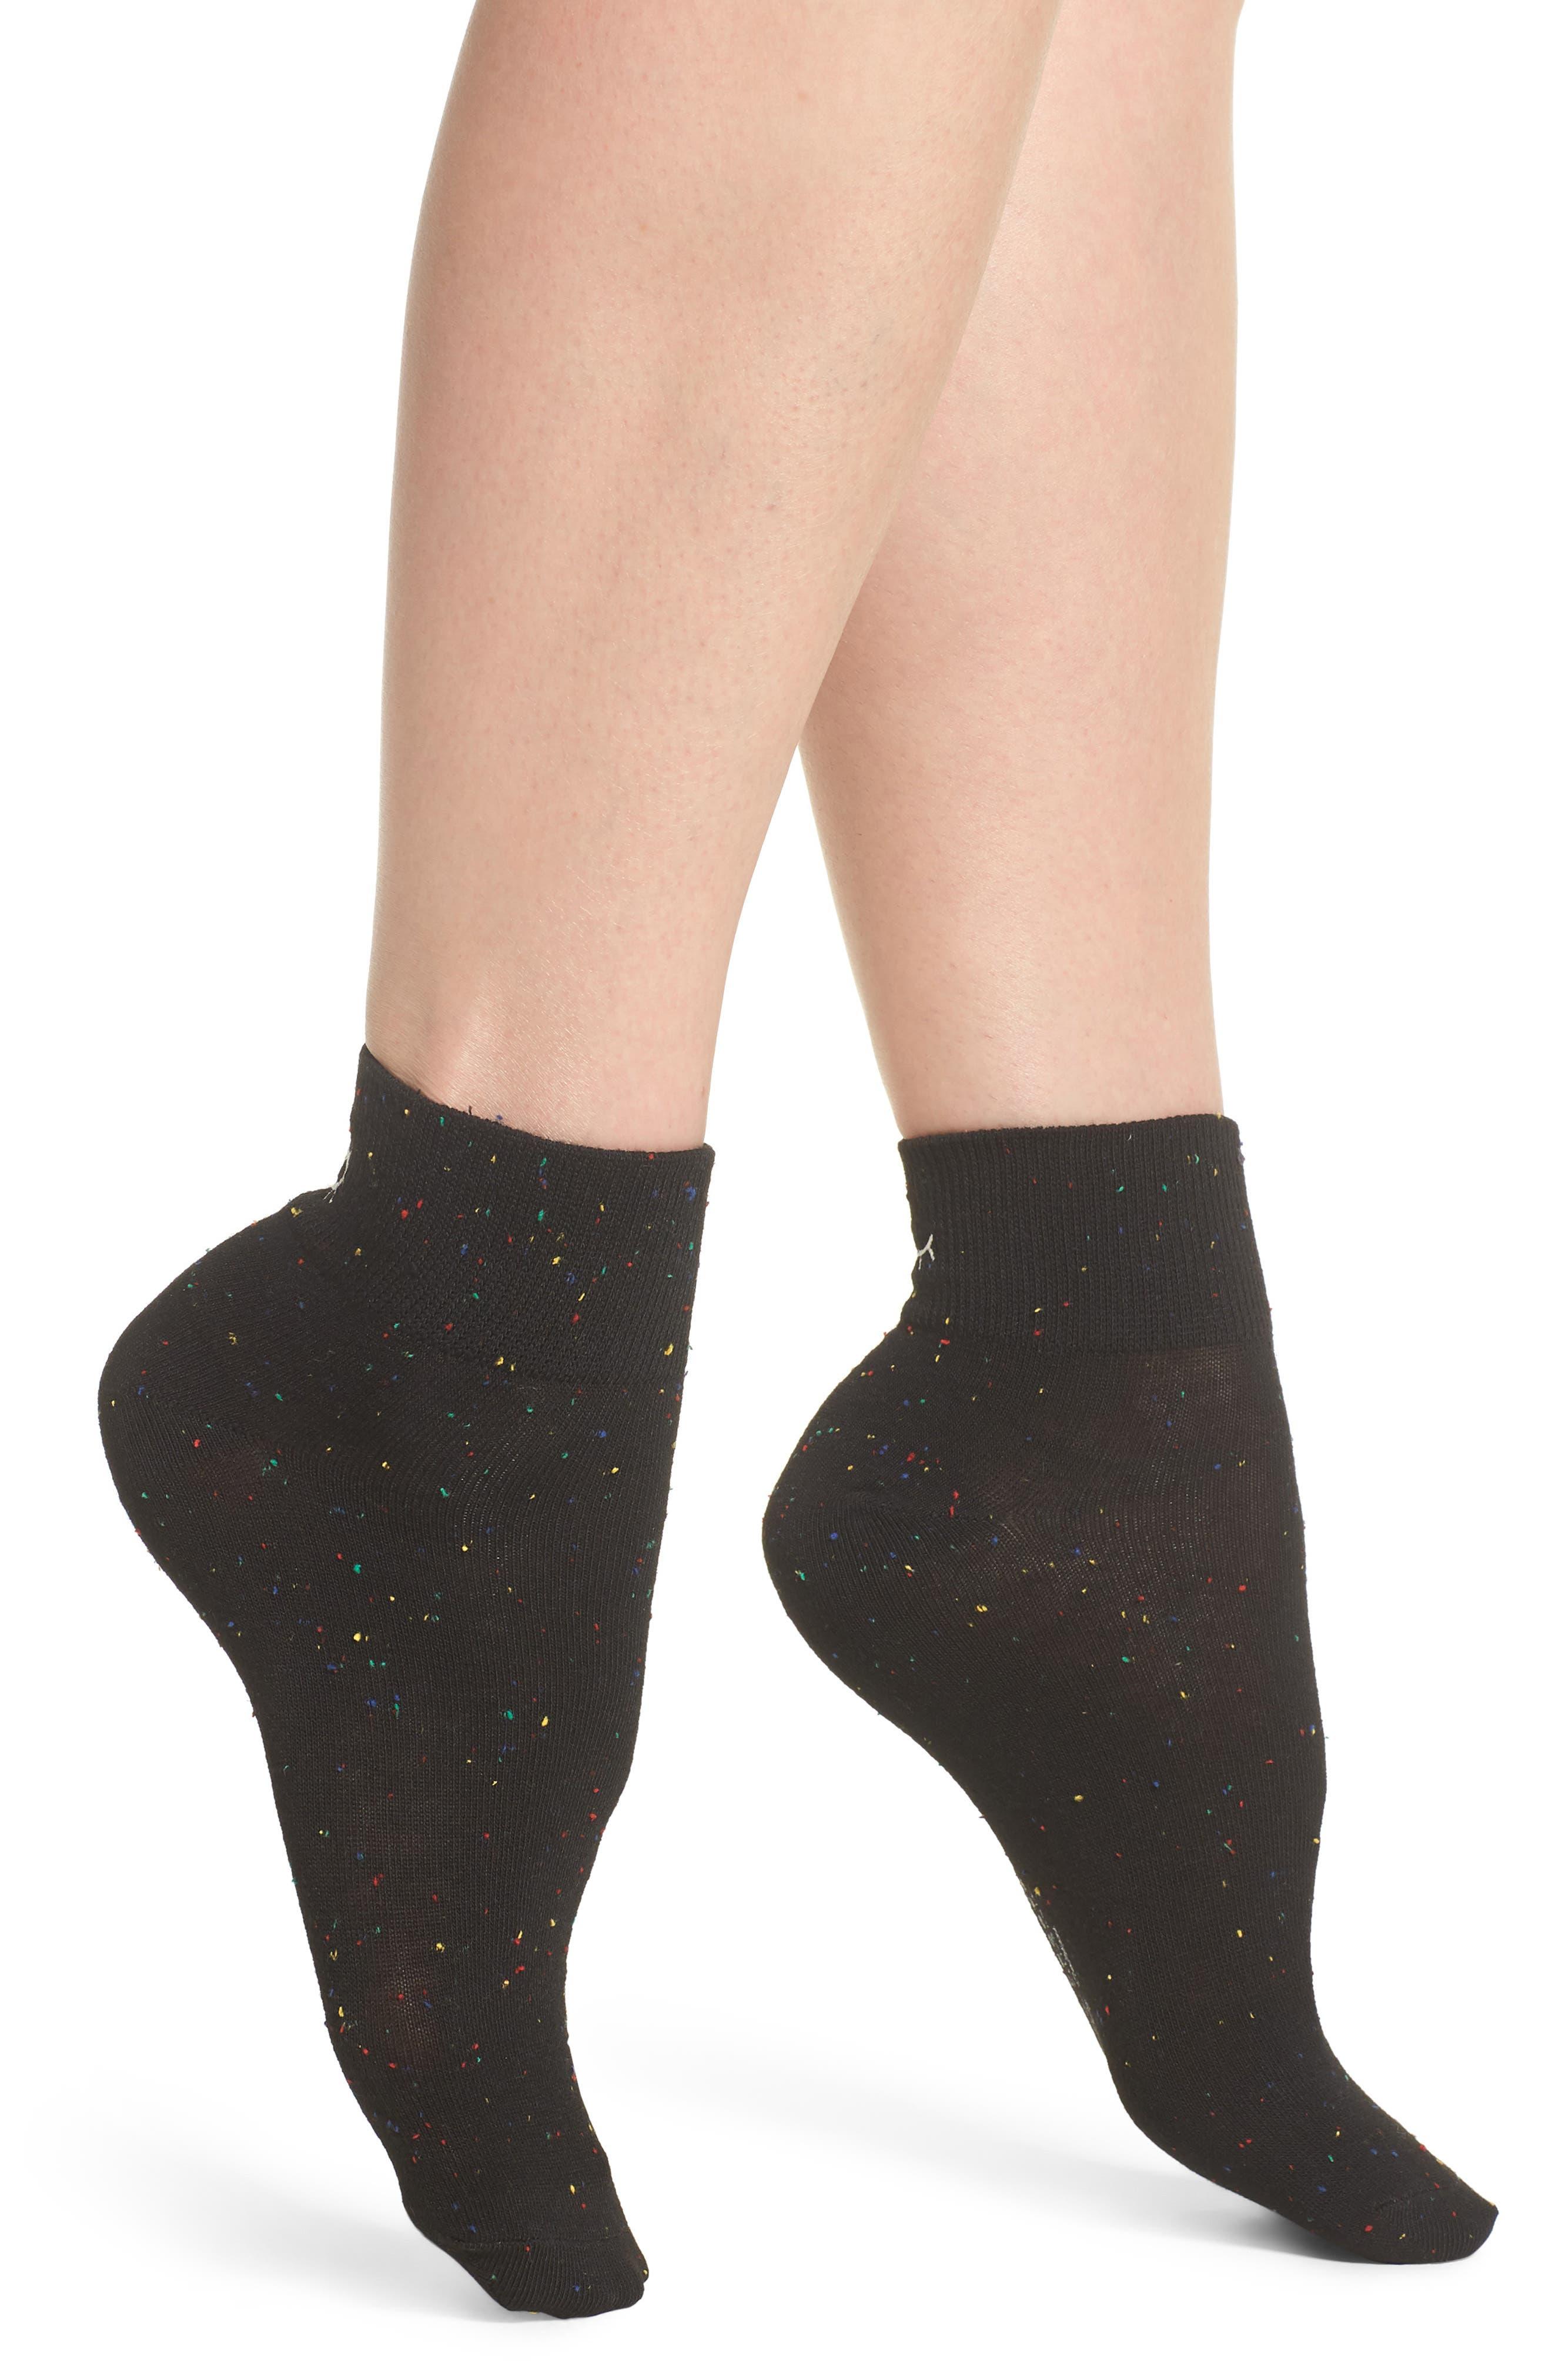 Blink Ankle Socks,                         Main,                         color,